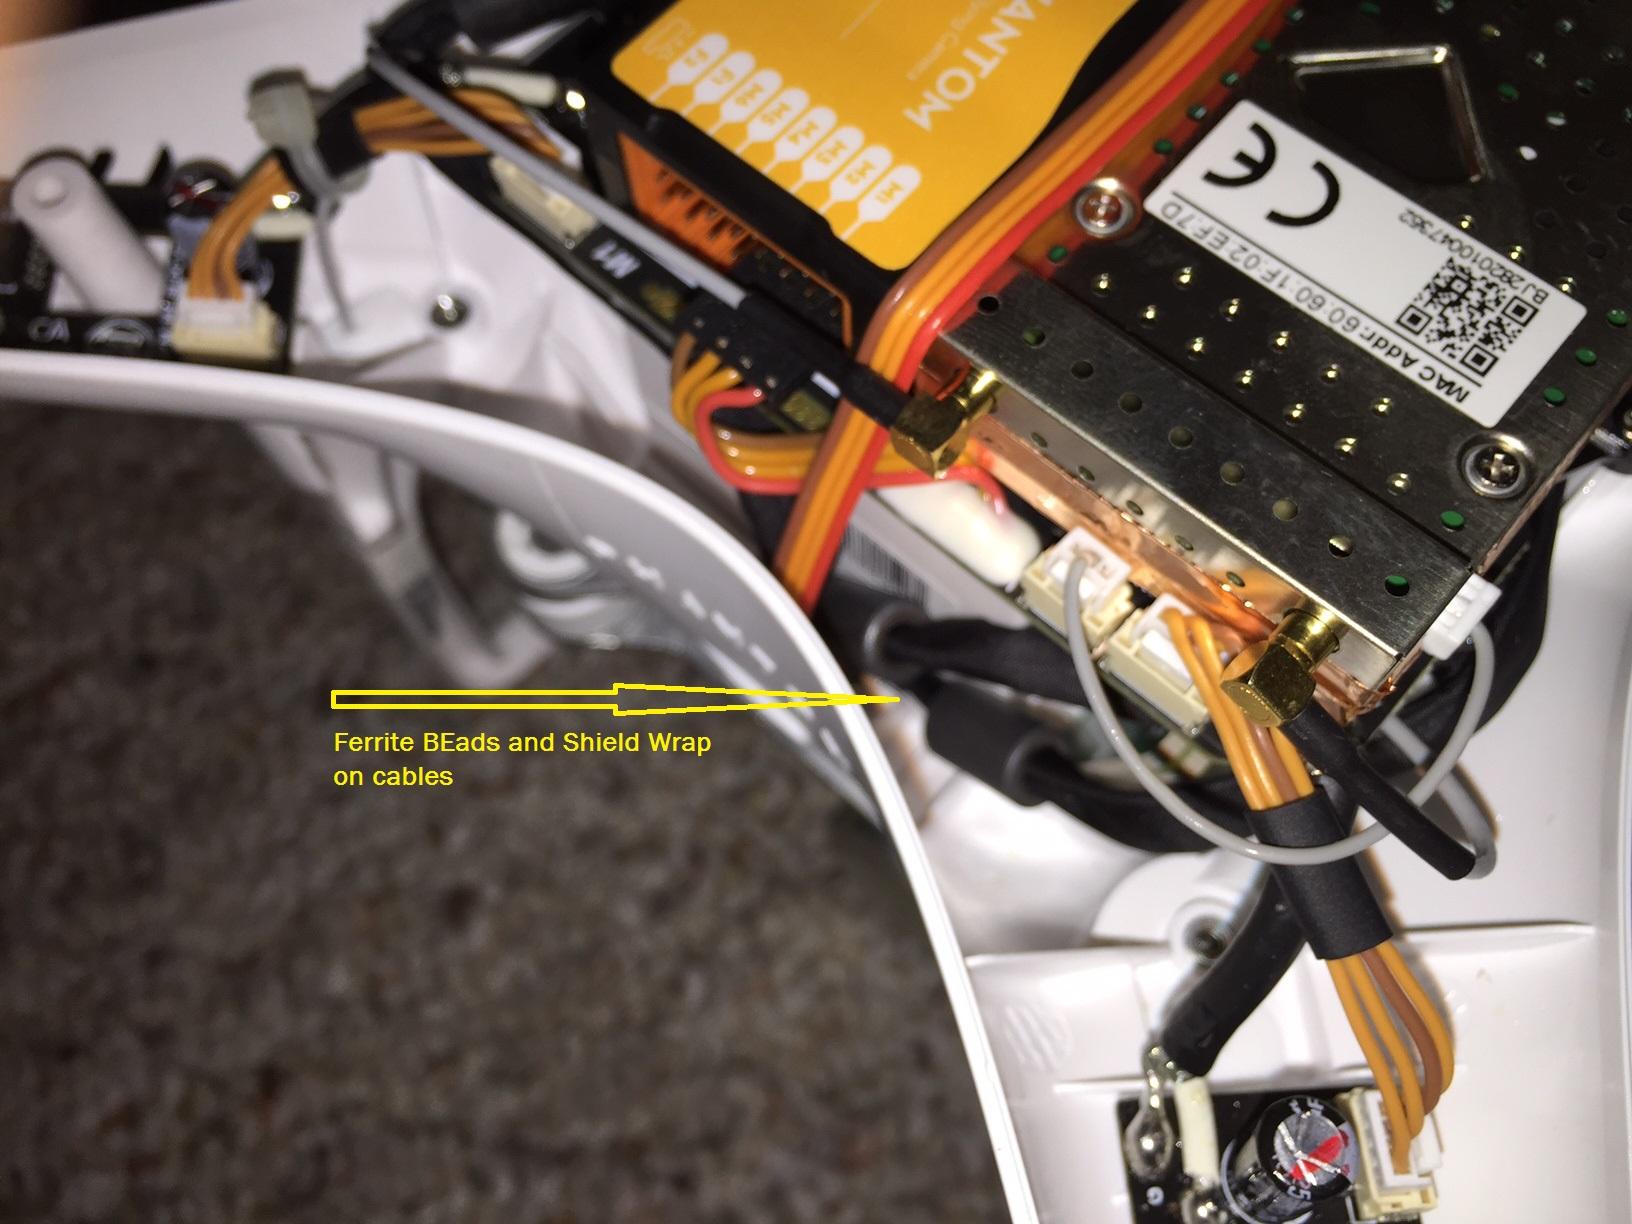 dji phantom 2 vision plus parts diagram motorbk co rh motorbk co dji phantom 2 vision wiring diagram dji phantom 2 vision wiring diagram